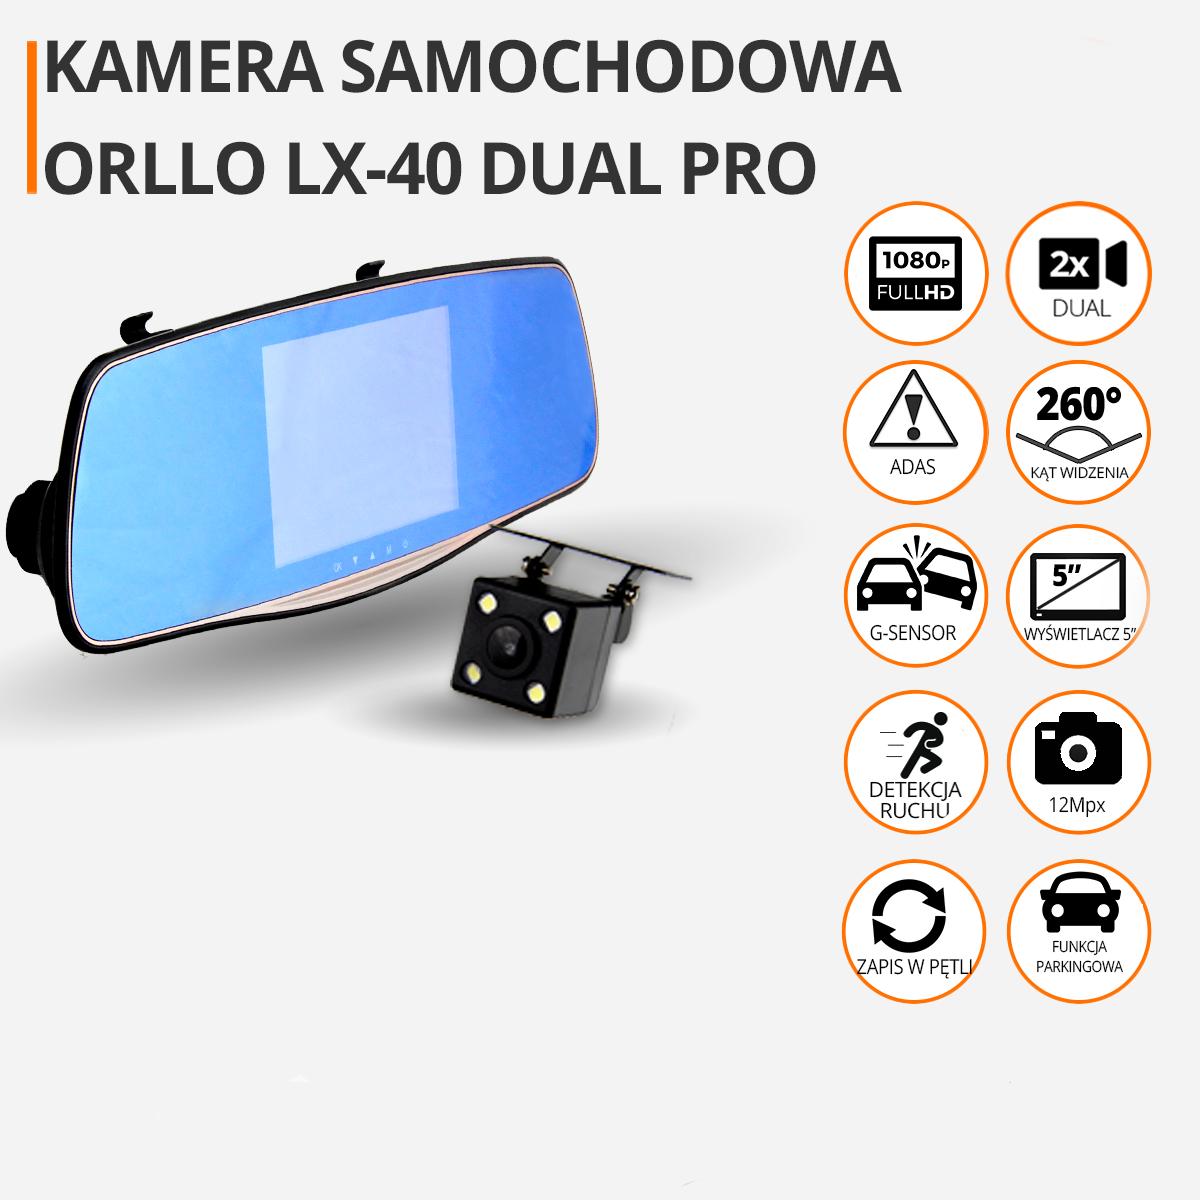 Kamera-samochodowa-LX40DUAL-funkcje-orllo-pl